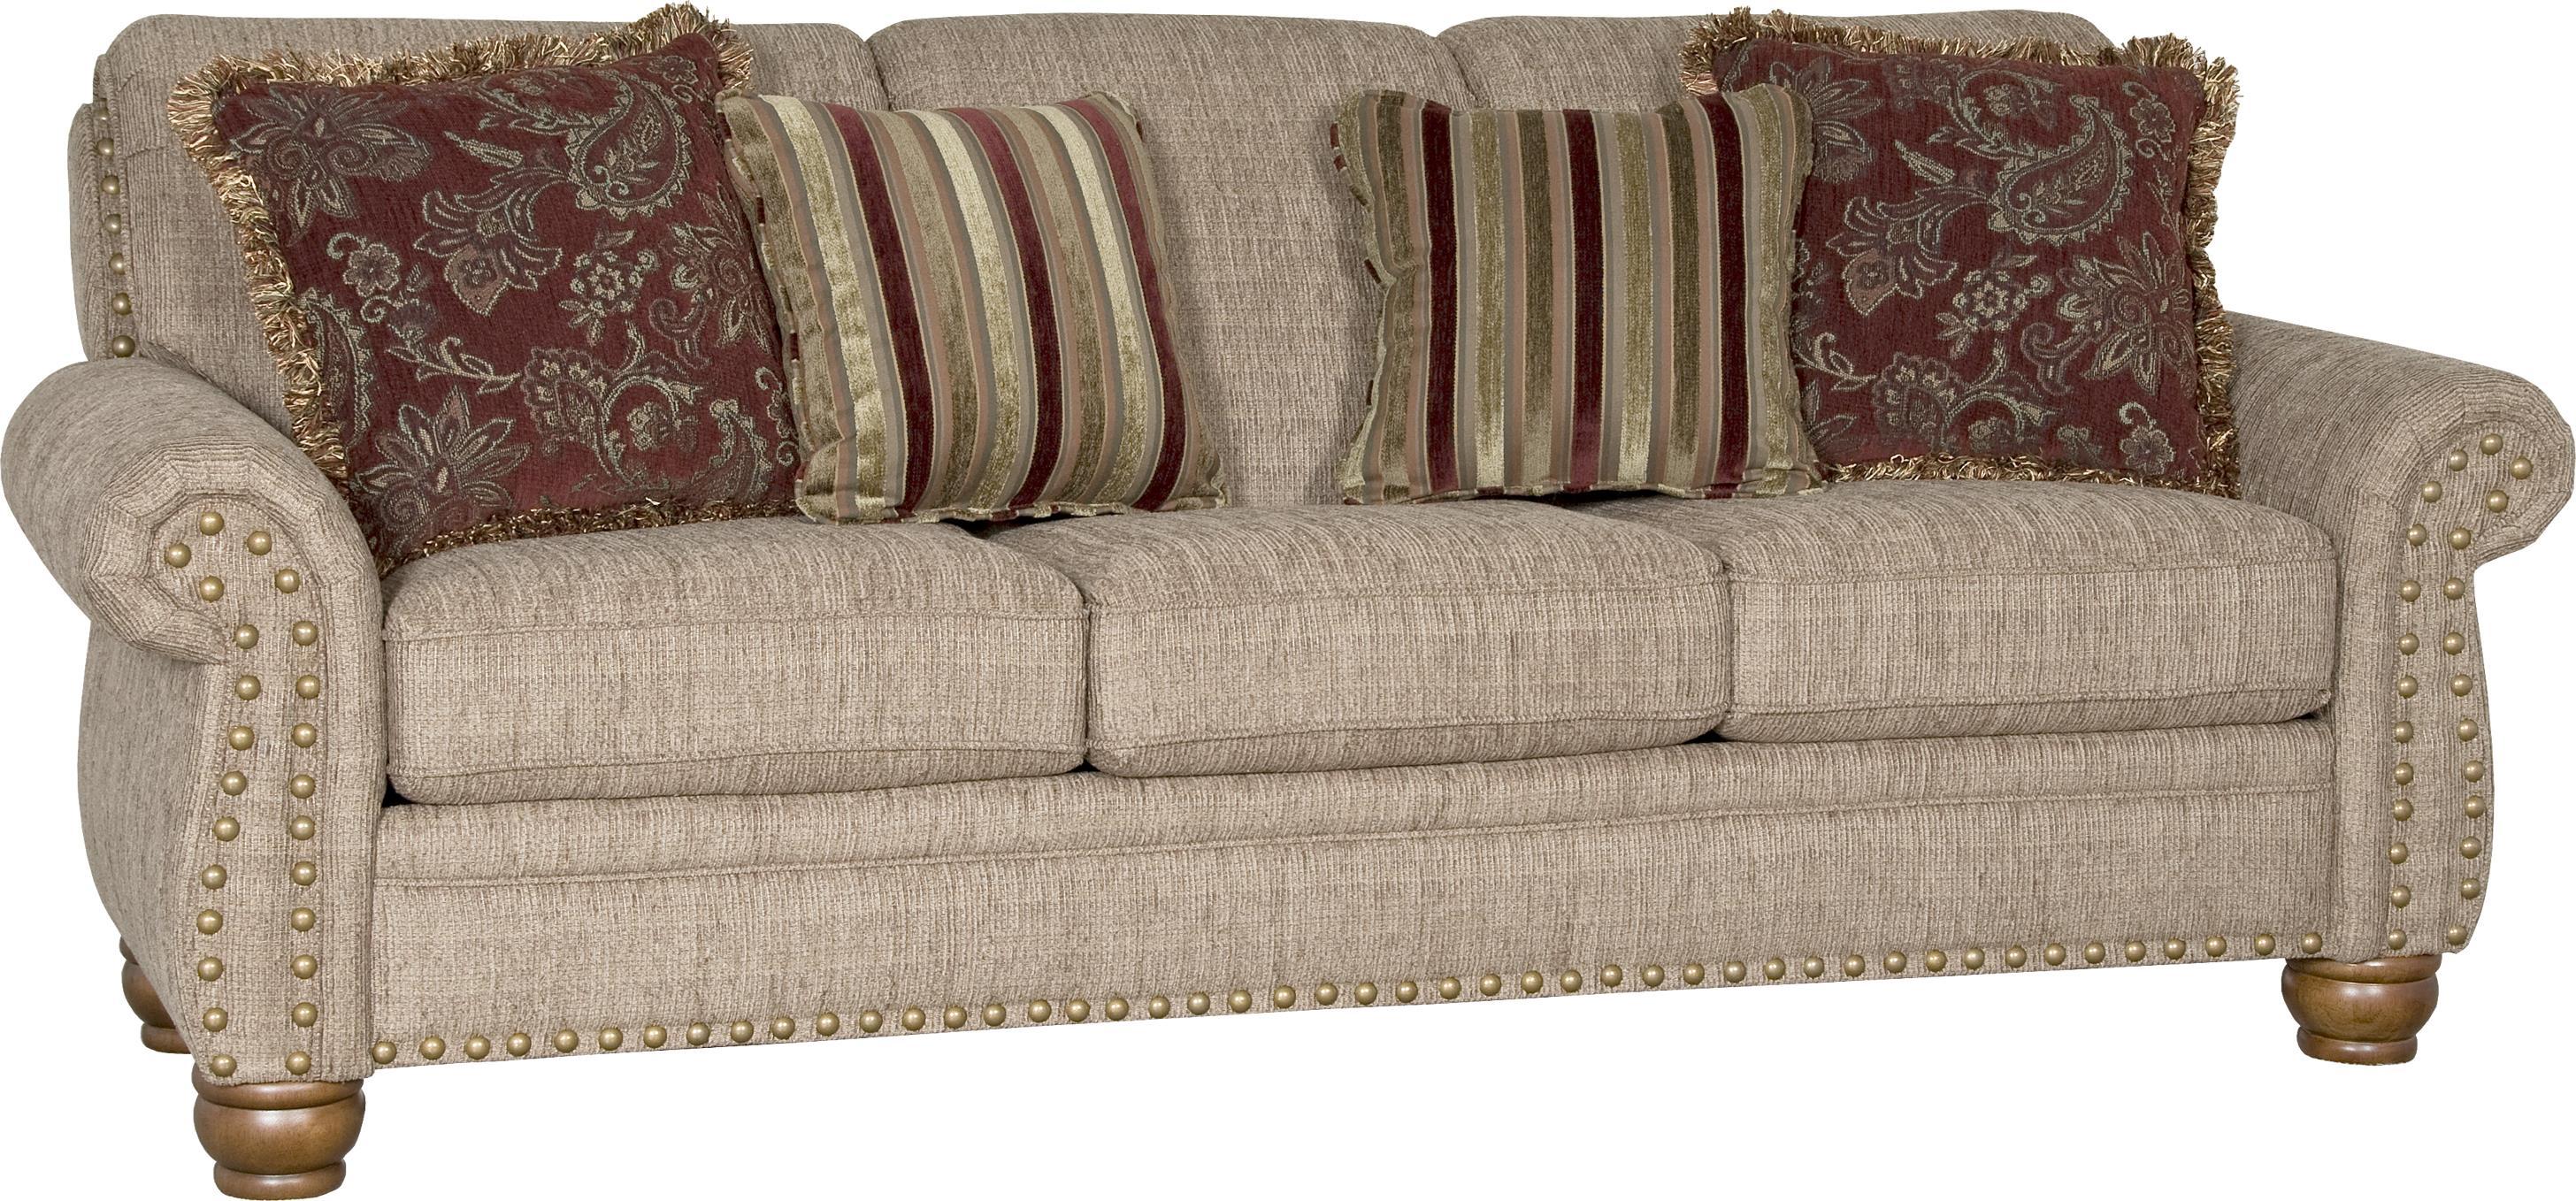 Mayo 9780 Sofa - Item Number: 9780F10-BOUYTA